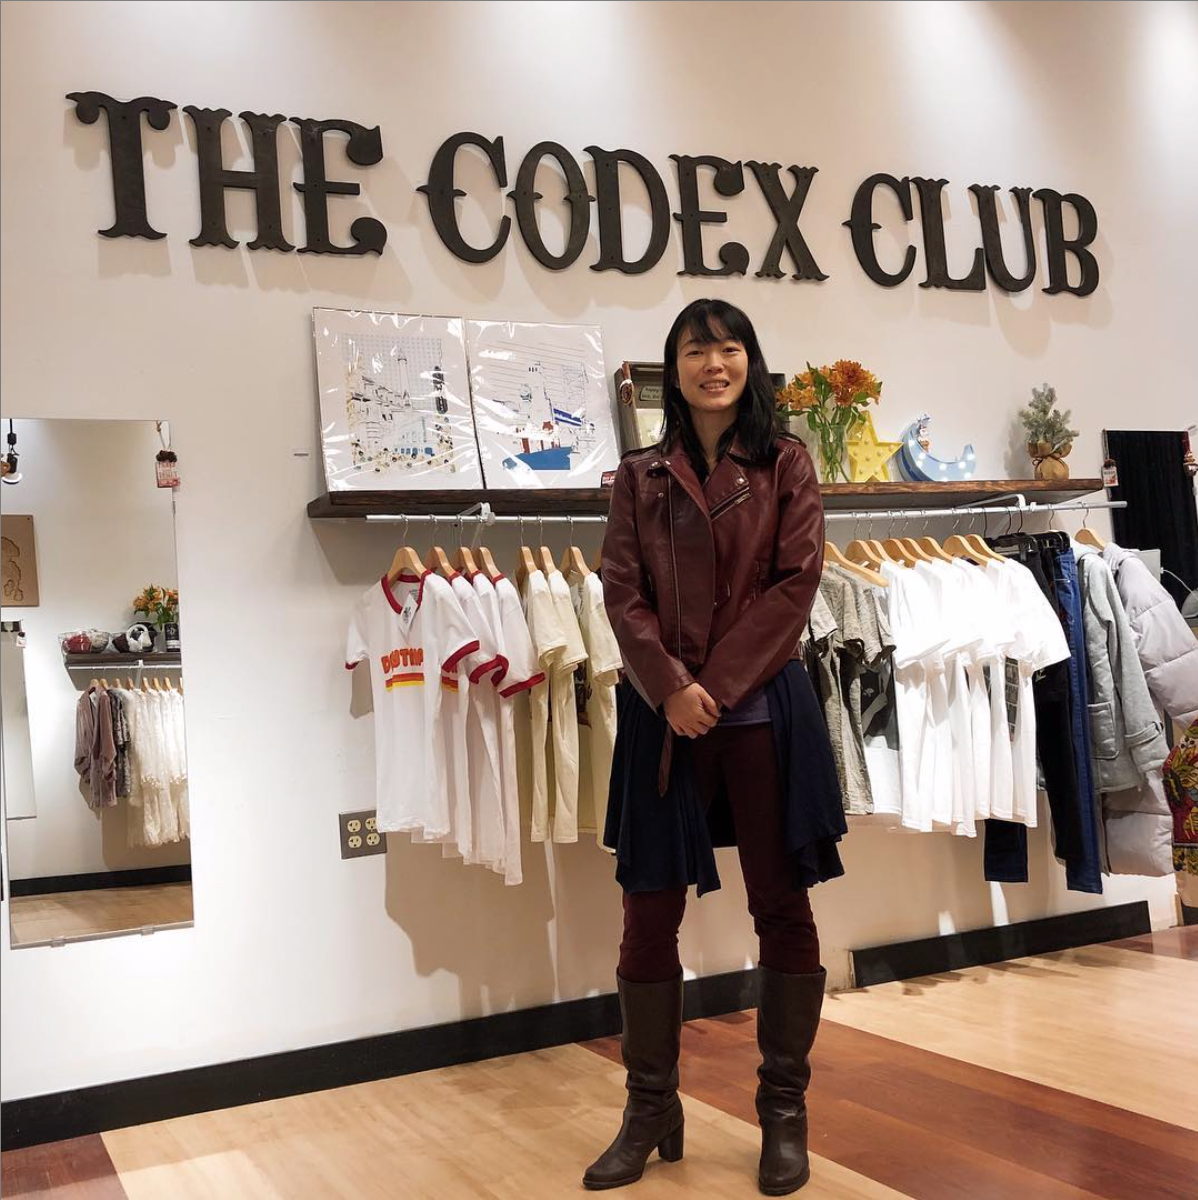 Codex club.png